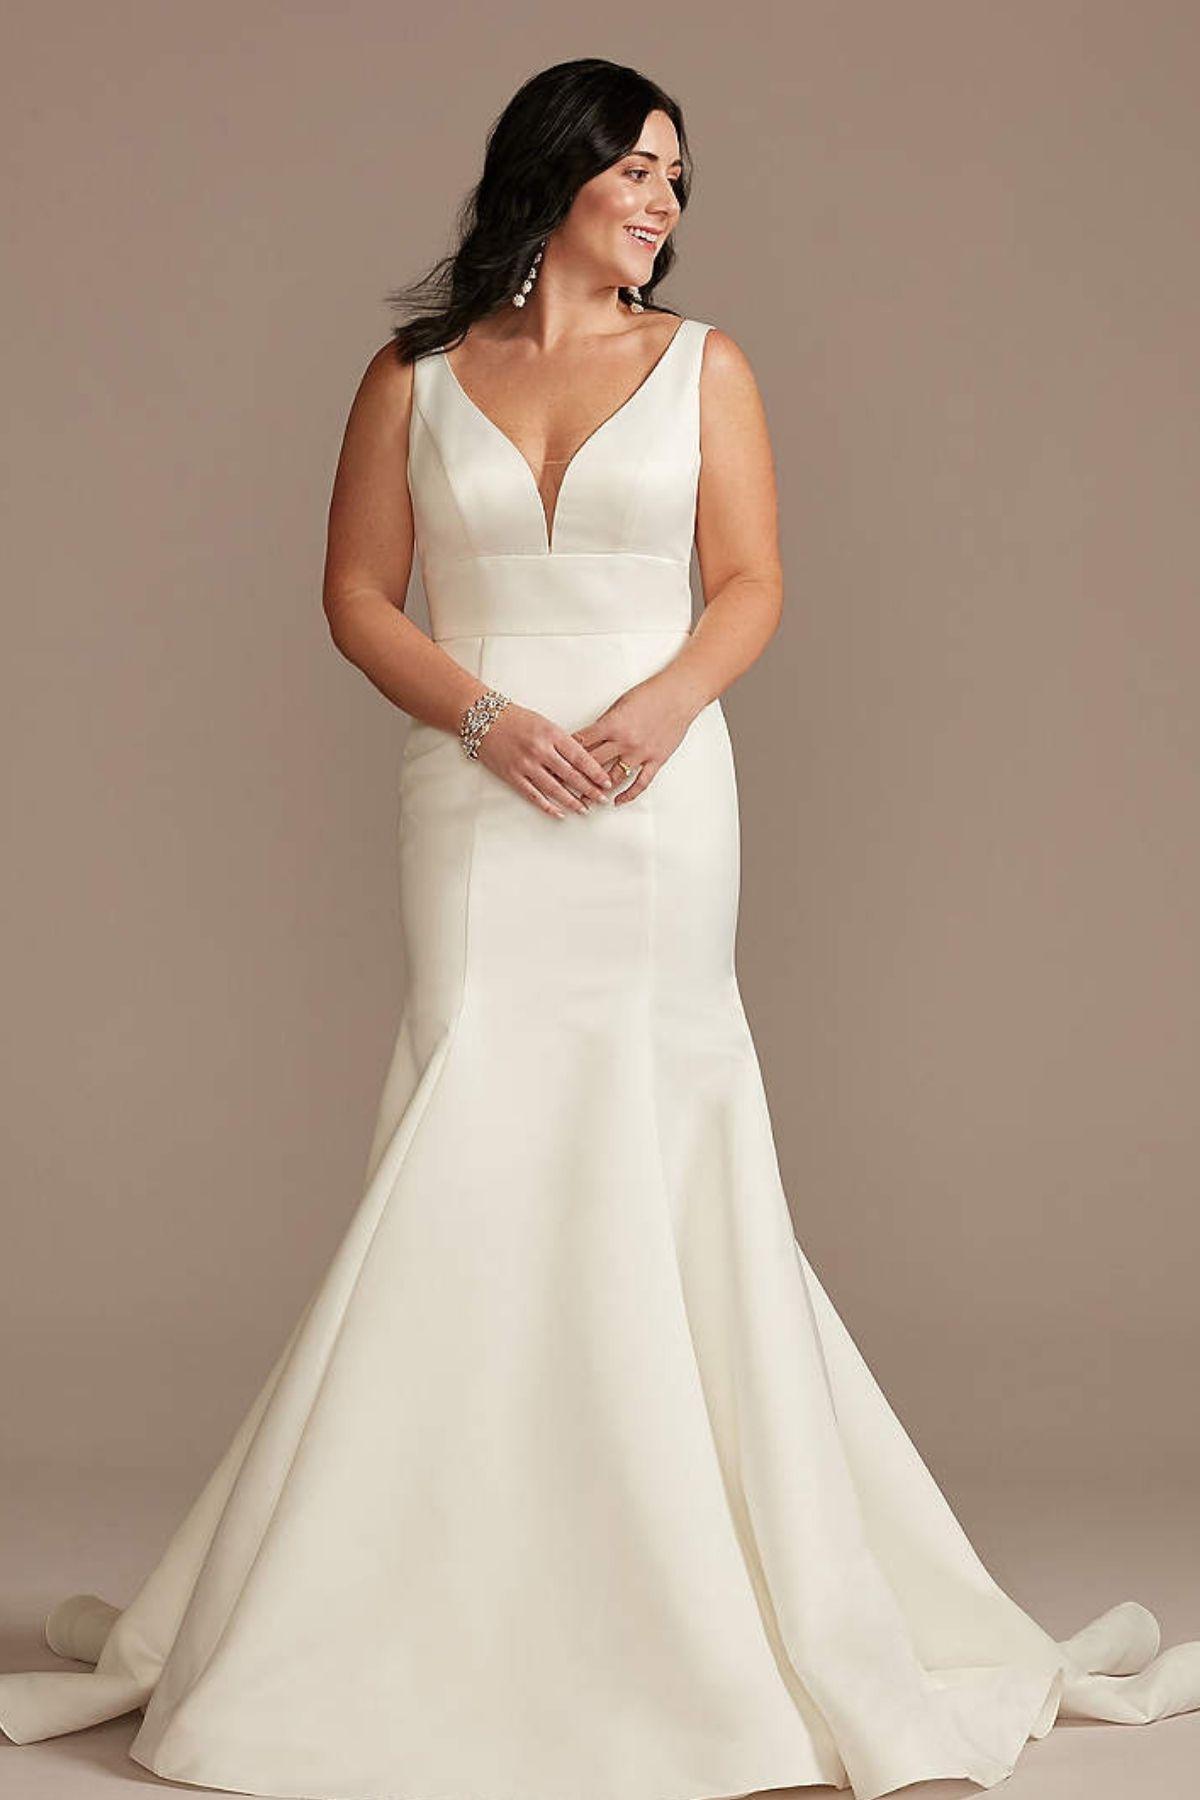 2. Plunge Mermaid Buttoned Satin Petite Wedding Dress